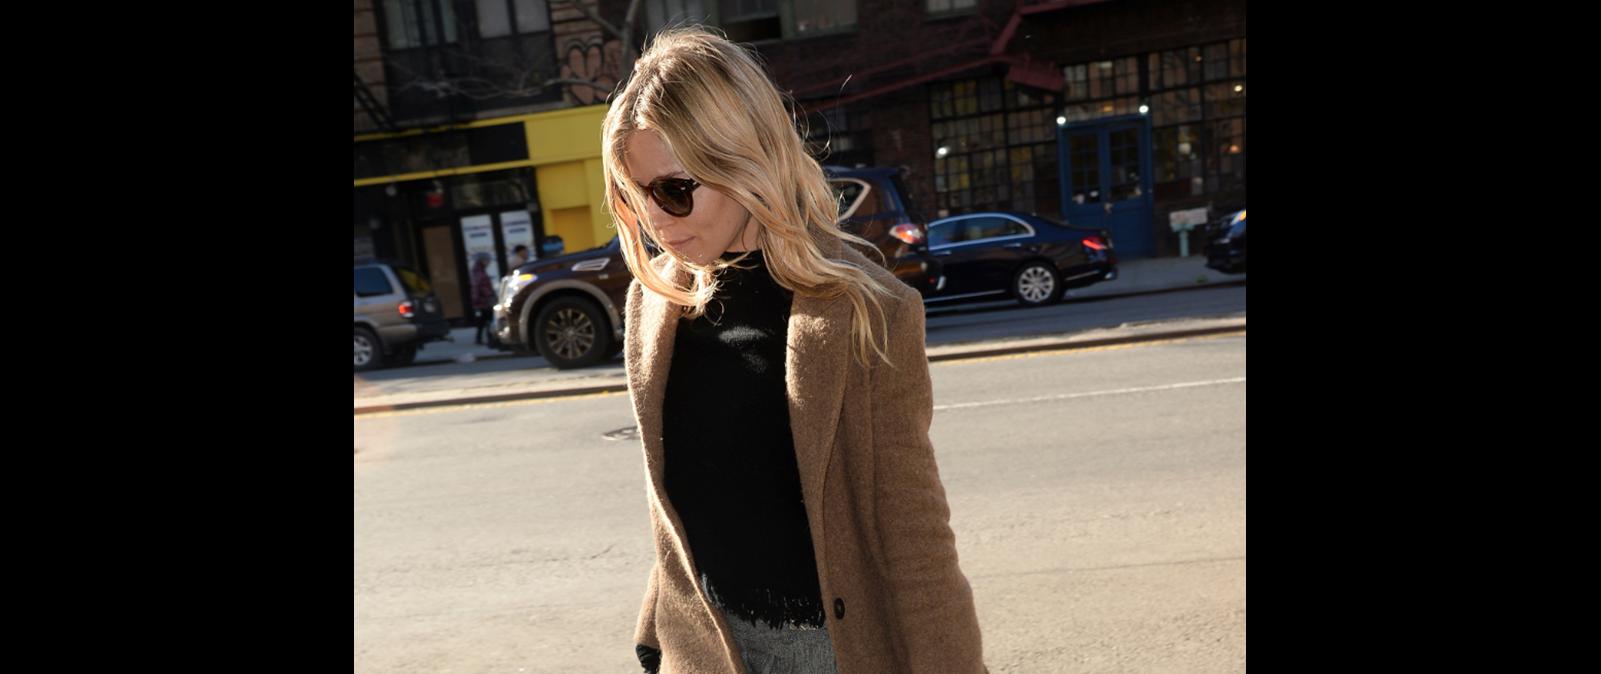 H Sienna Miller φορά το παλτό που θέλουμε να αγοράσουμε το φετινό χειμώνα 14e53a7bc17